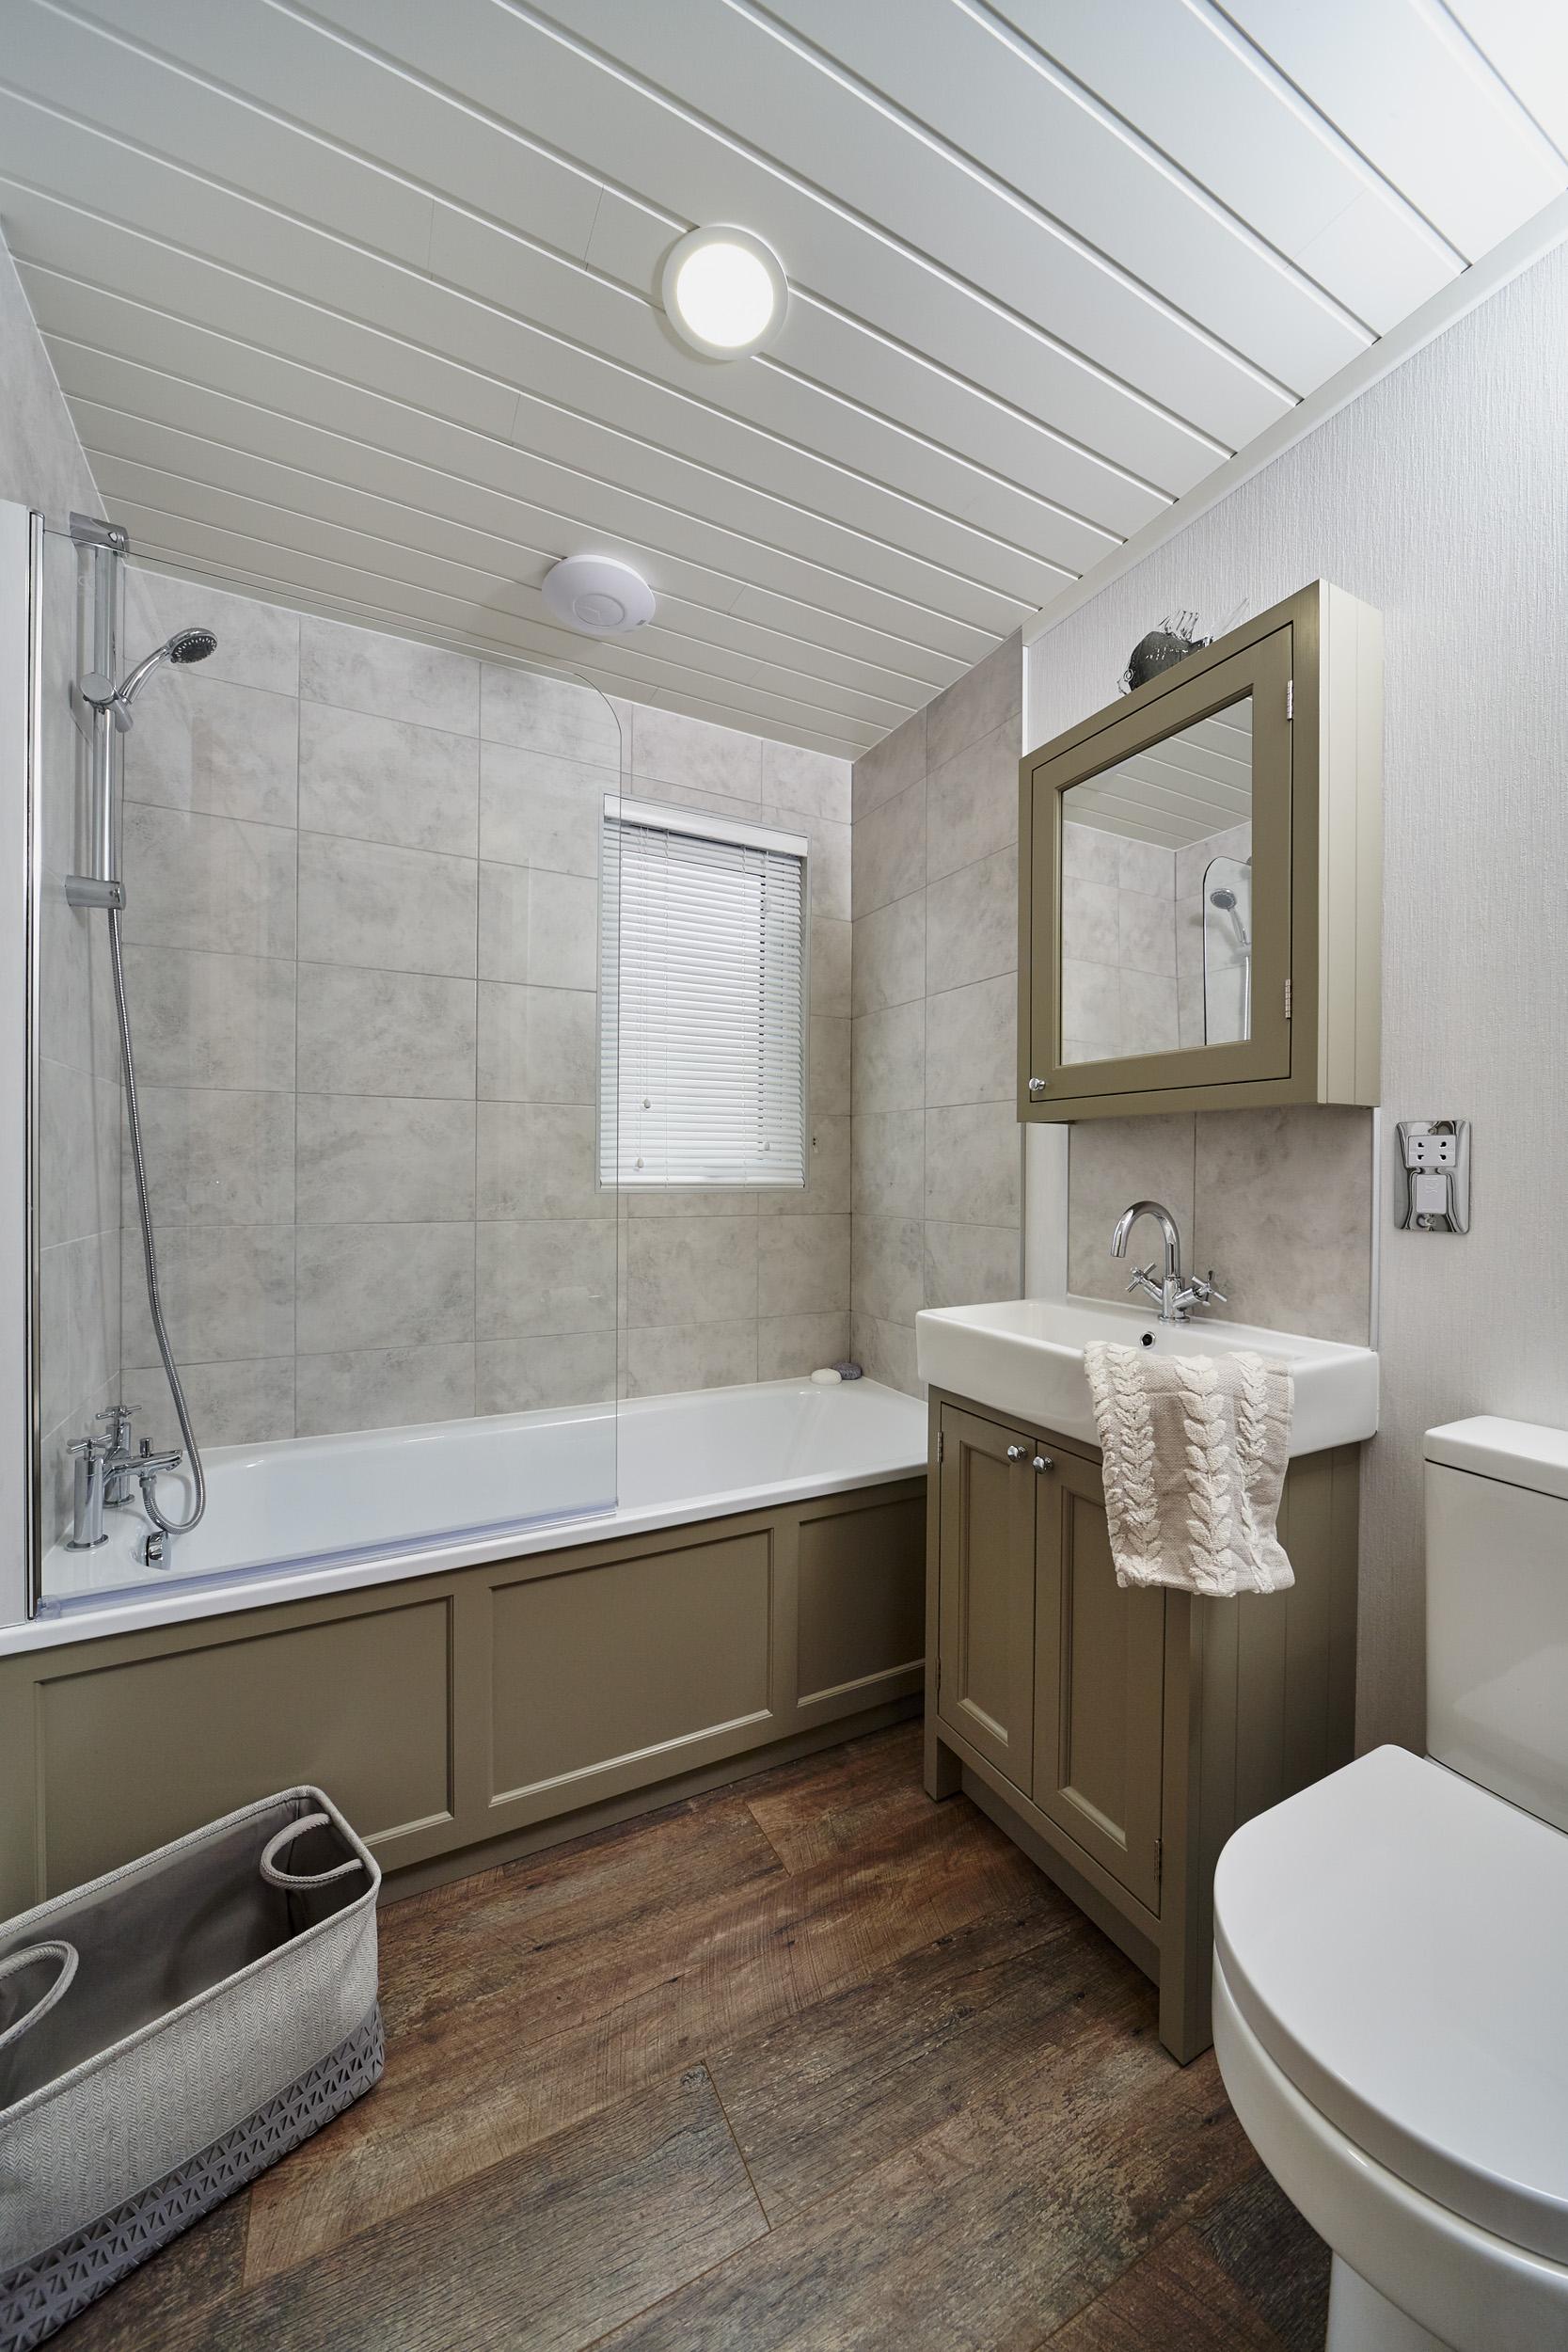 The Muskoka lodge, bathroom